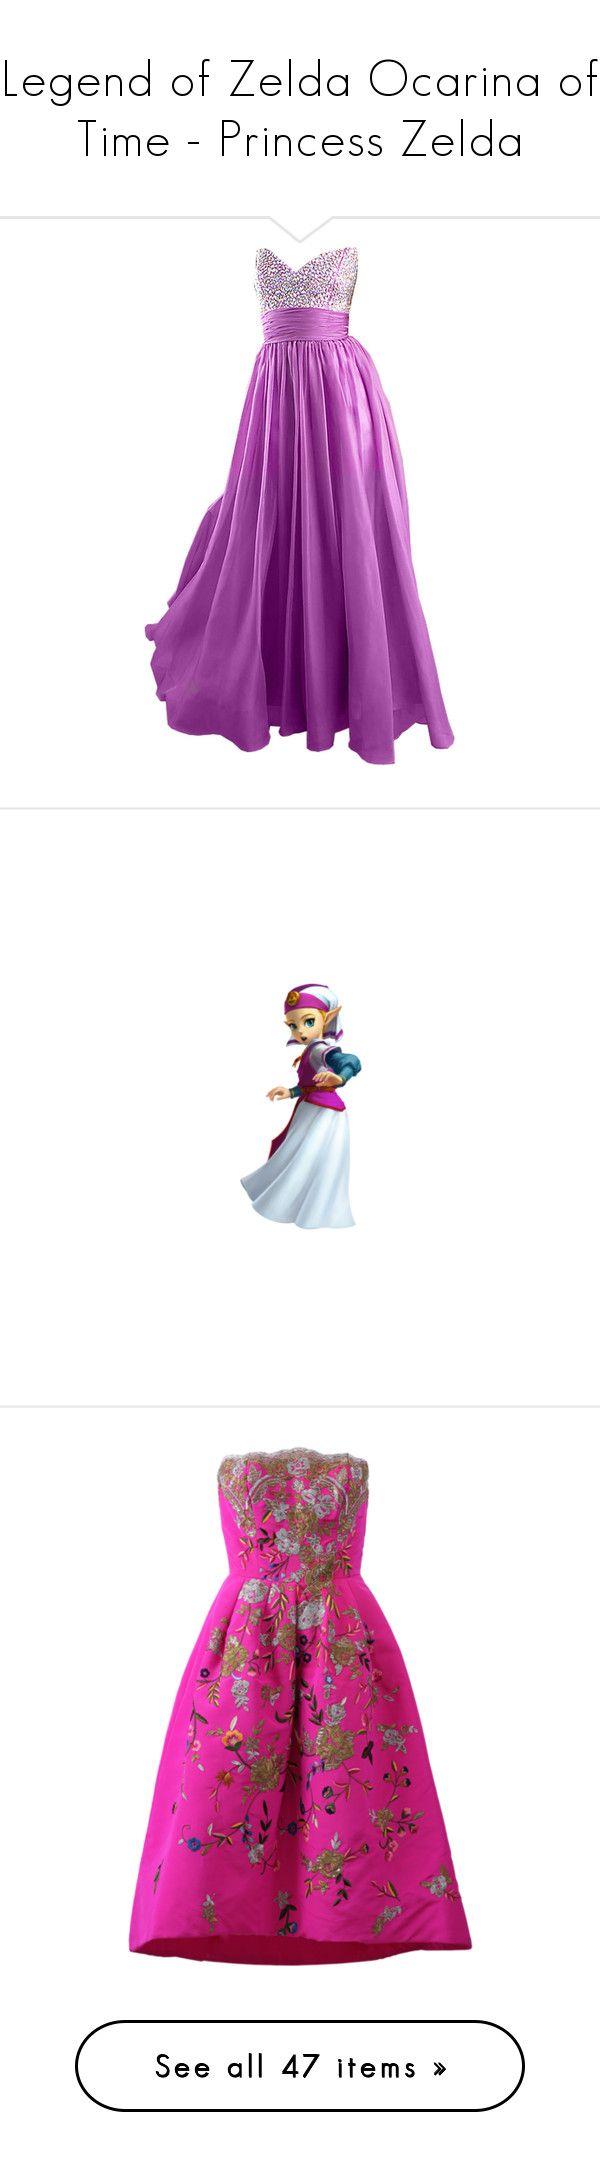 """Legend of Zelda Ocarina of Time - Princess Zelda"" by marielw97 ❤ liked on Polyvore featuring the legend of zelda, dresses, gowns, long dresses, vestidos, oscar de la renta, cocktail dresses, pink midi dress, embroidery dress and floral midi dress"